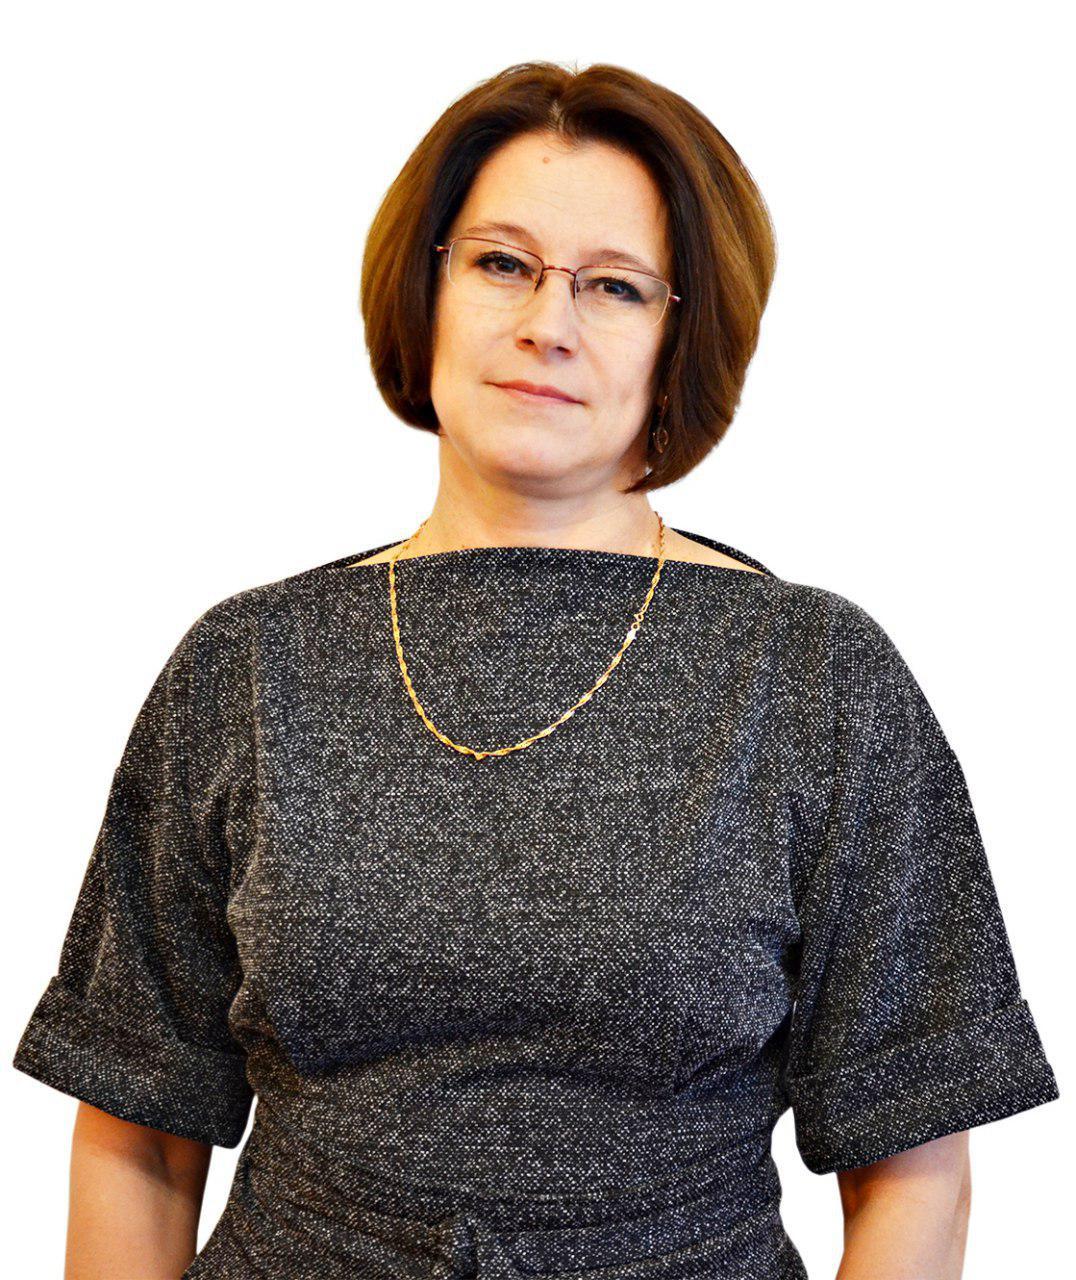 Контрольно счетная палата Строкинова Ирина Евгеньевна Председатель Контрольно счетной палаты города